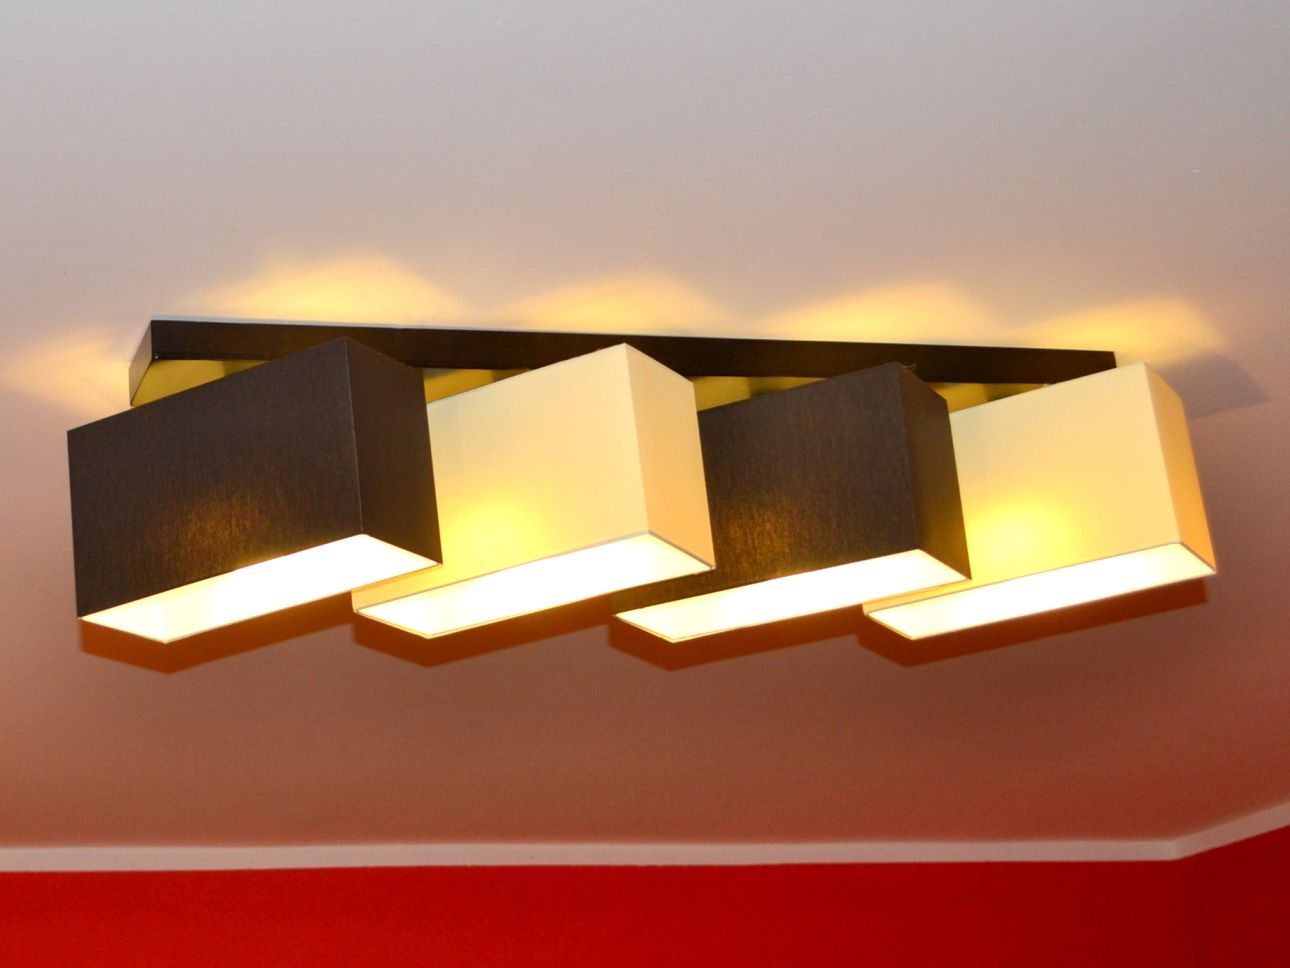 deckenlampe deckenleuchte lampe leuchte 4 flammig edles design edel merano b4dl. Black Bedroom Furniture Sets. Home Design Ideas